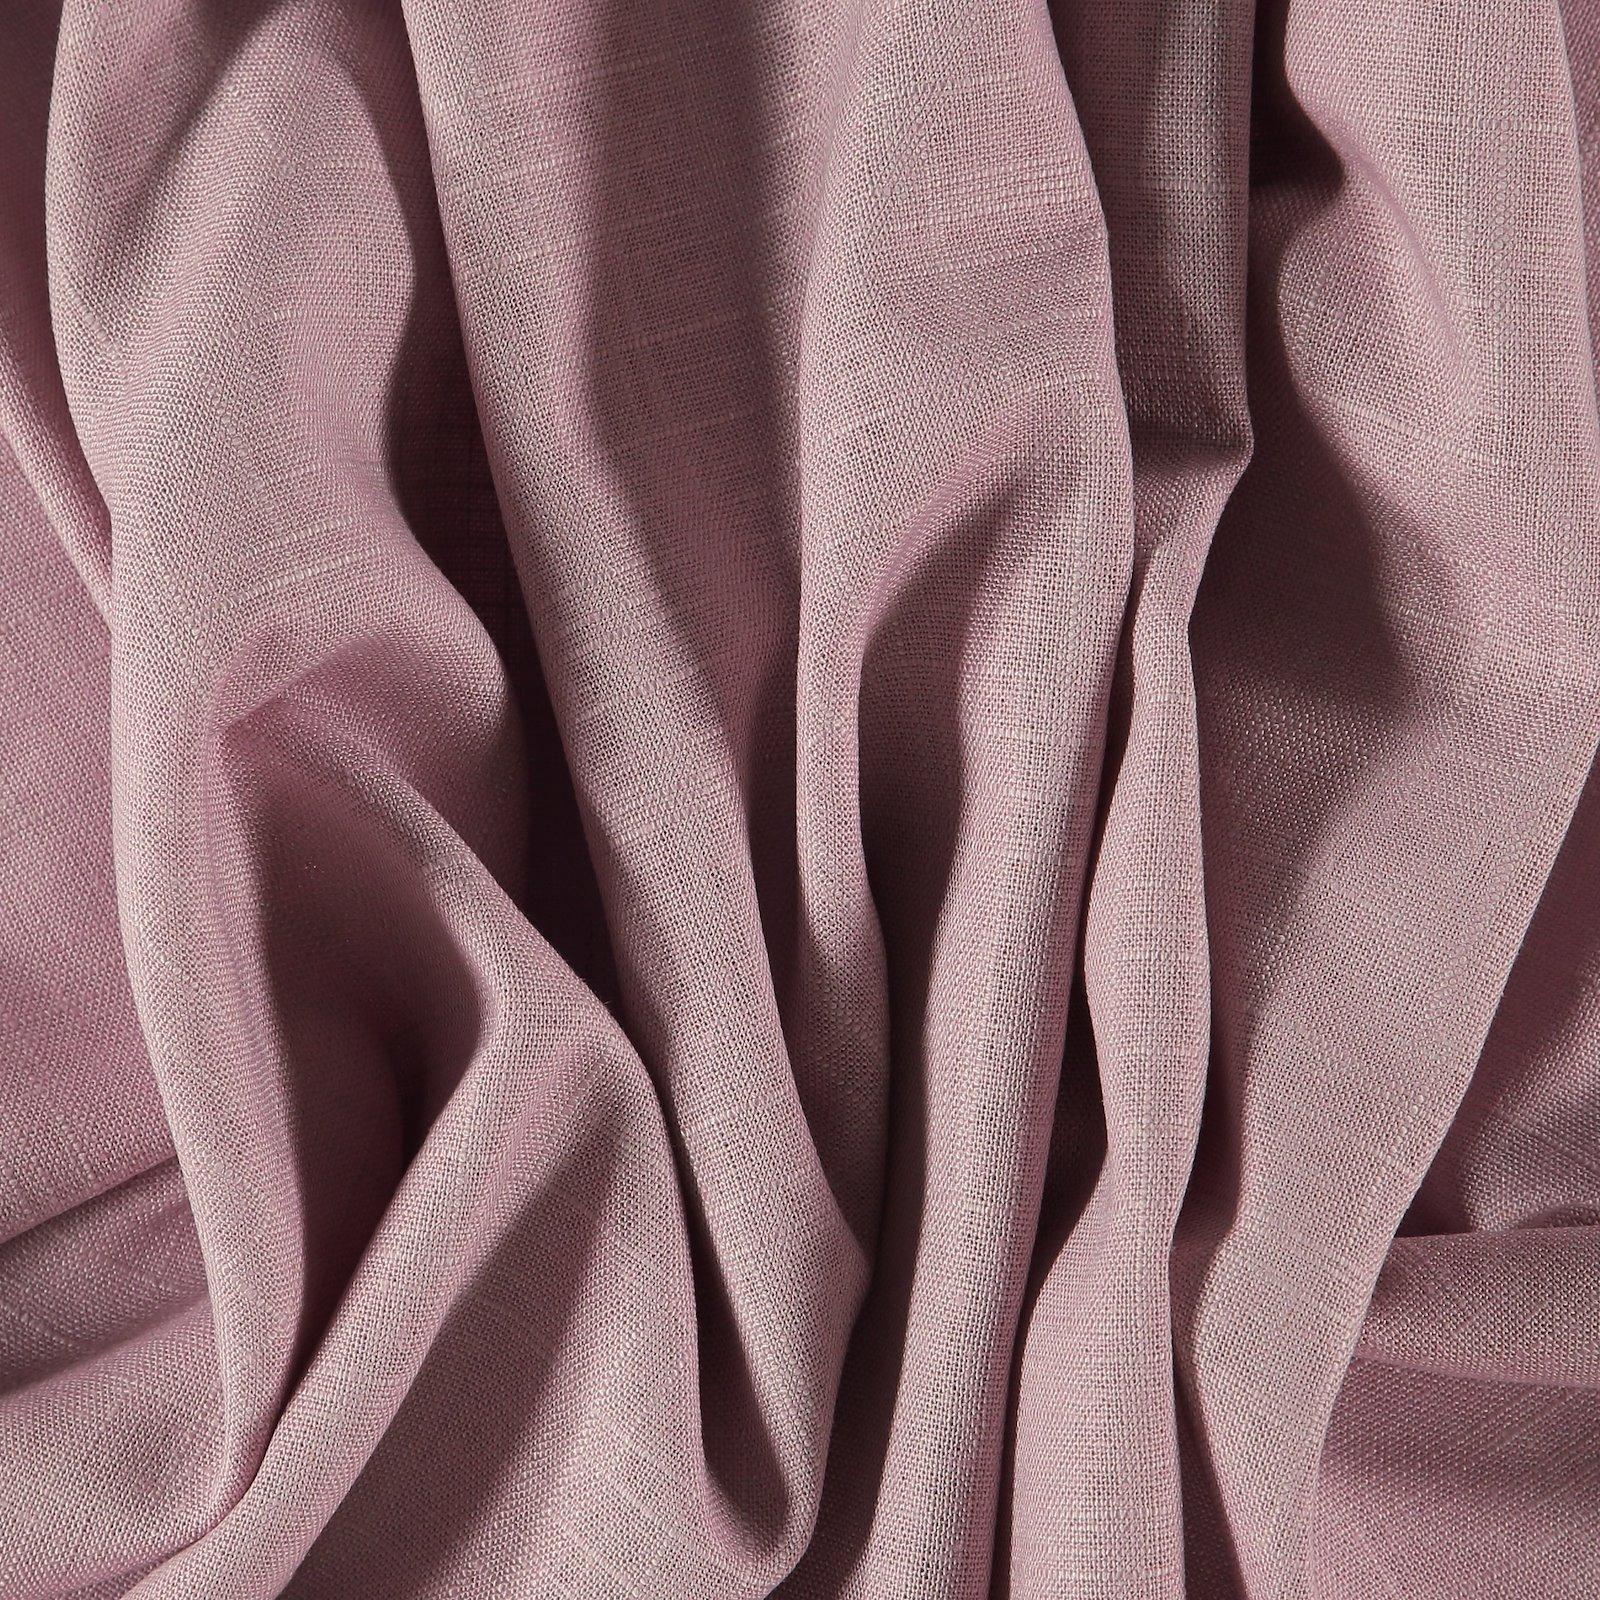 Coarse linen/viscose light dusty violet 852356_pack